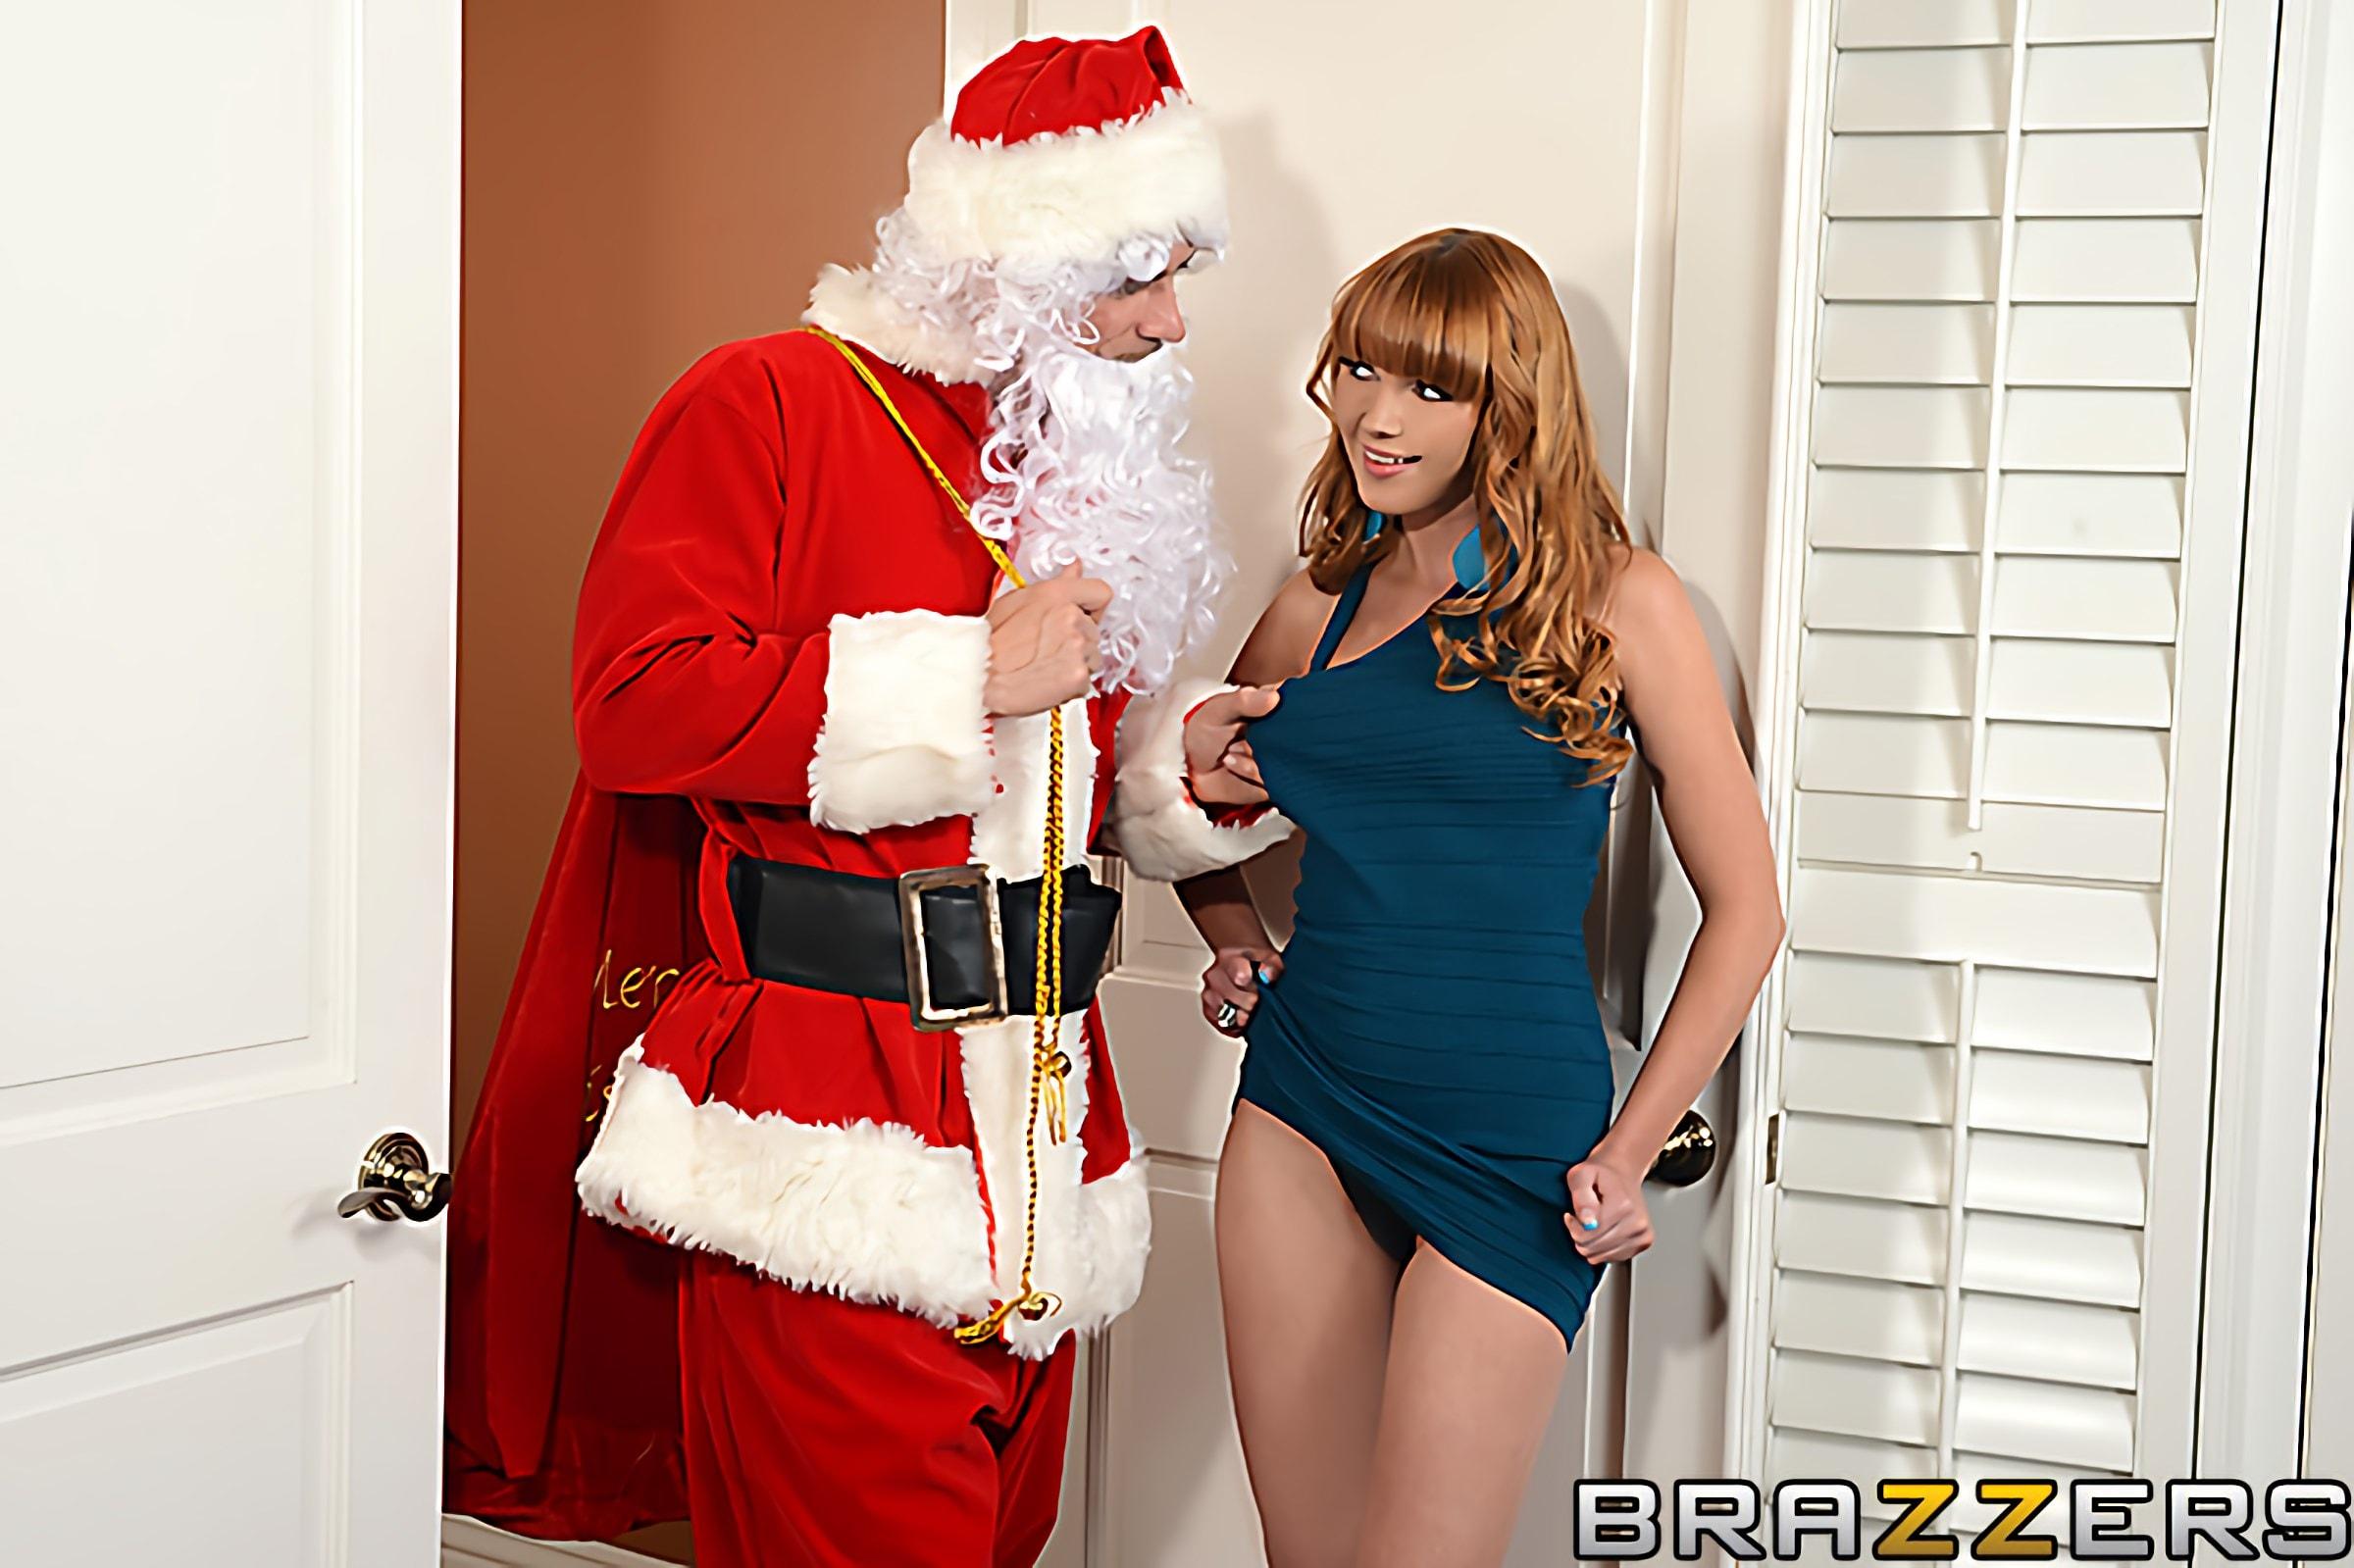 Brazzers 'Shiatsu Santa' starring Marie McCray (Photo 1)